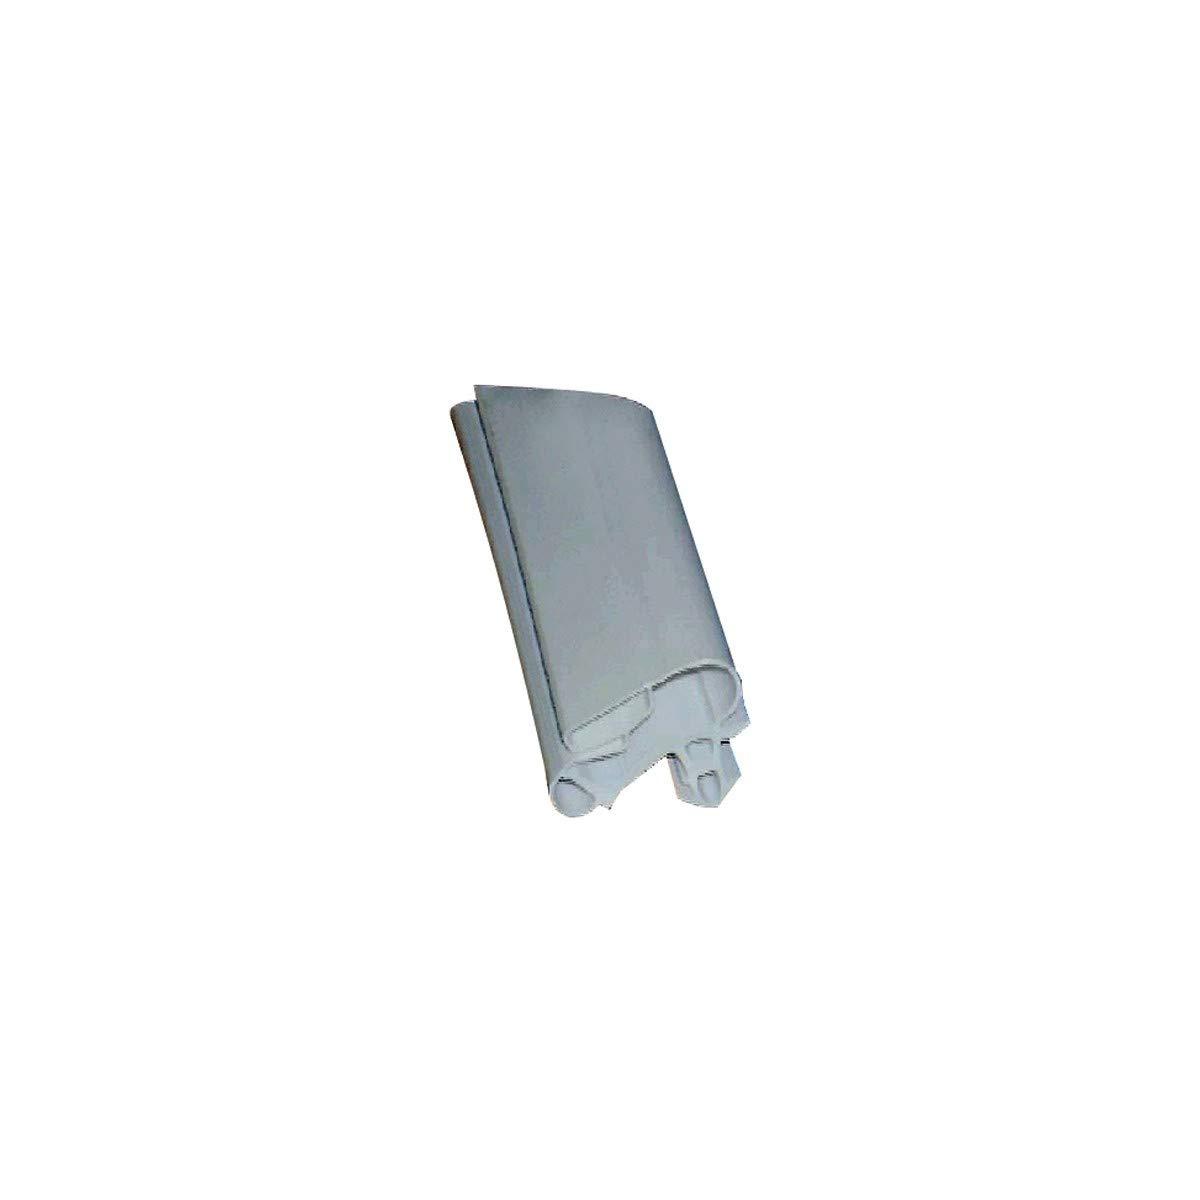 Recamania Burlete congelador frigorífico. Mod. 4FS627SLR01 ...